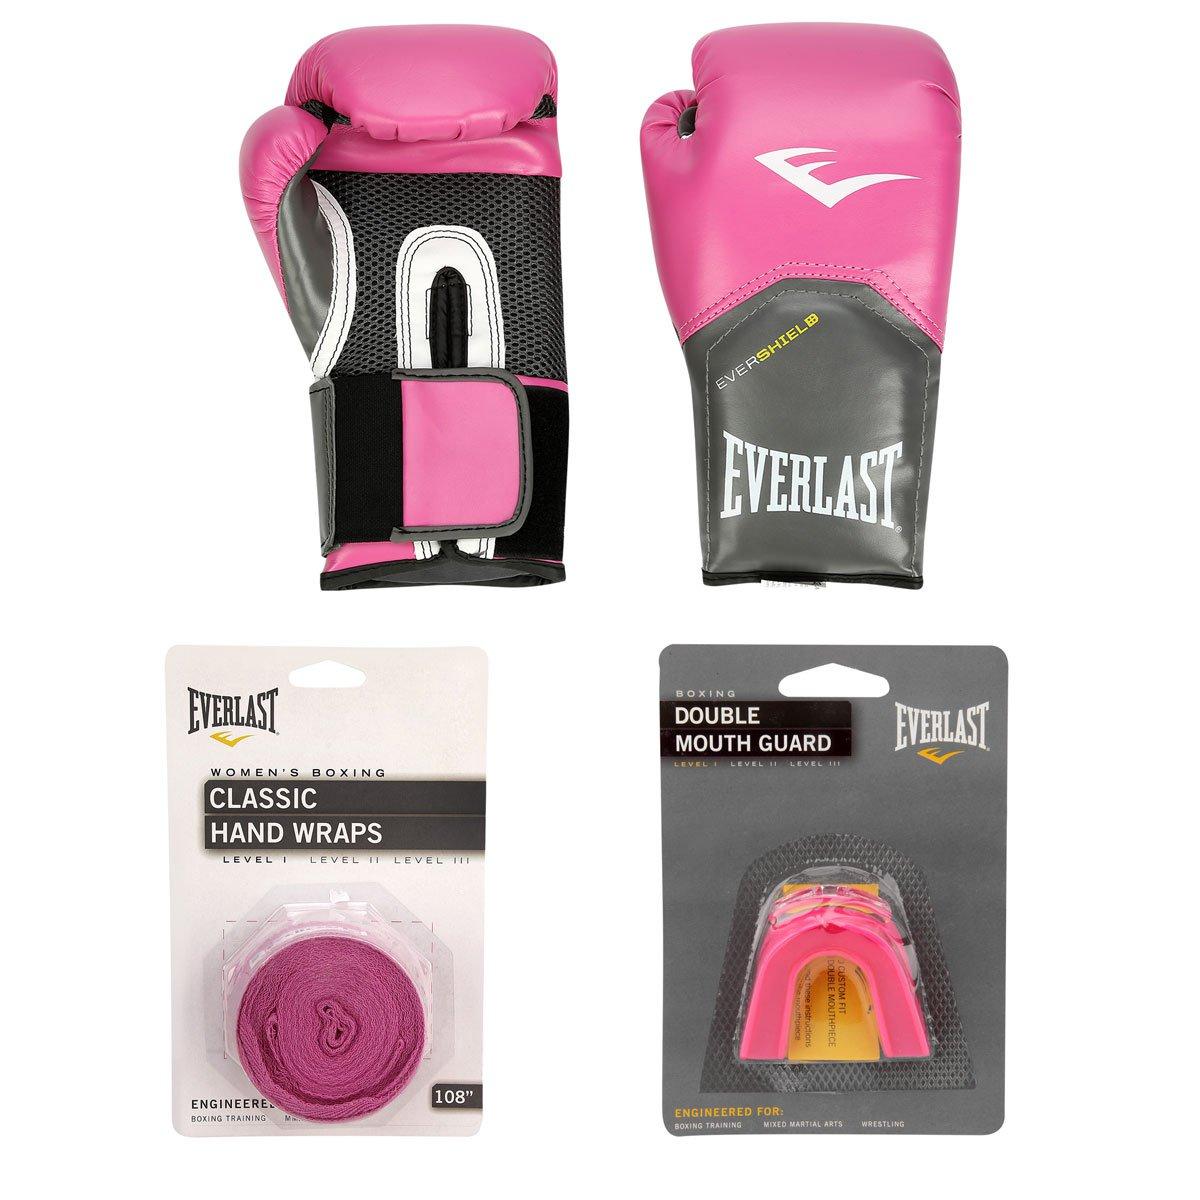 50f0d51af Kit Everlast Luva de Boxe Muay Thai Everlast Pro Style - 8 oz + Bandagem  Elástica + Protetor Bucal